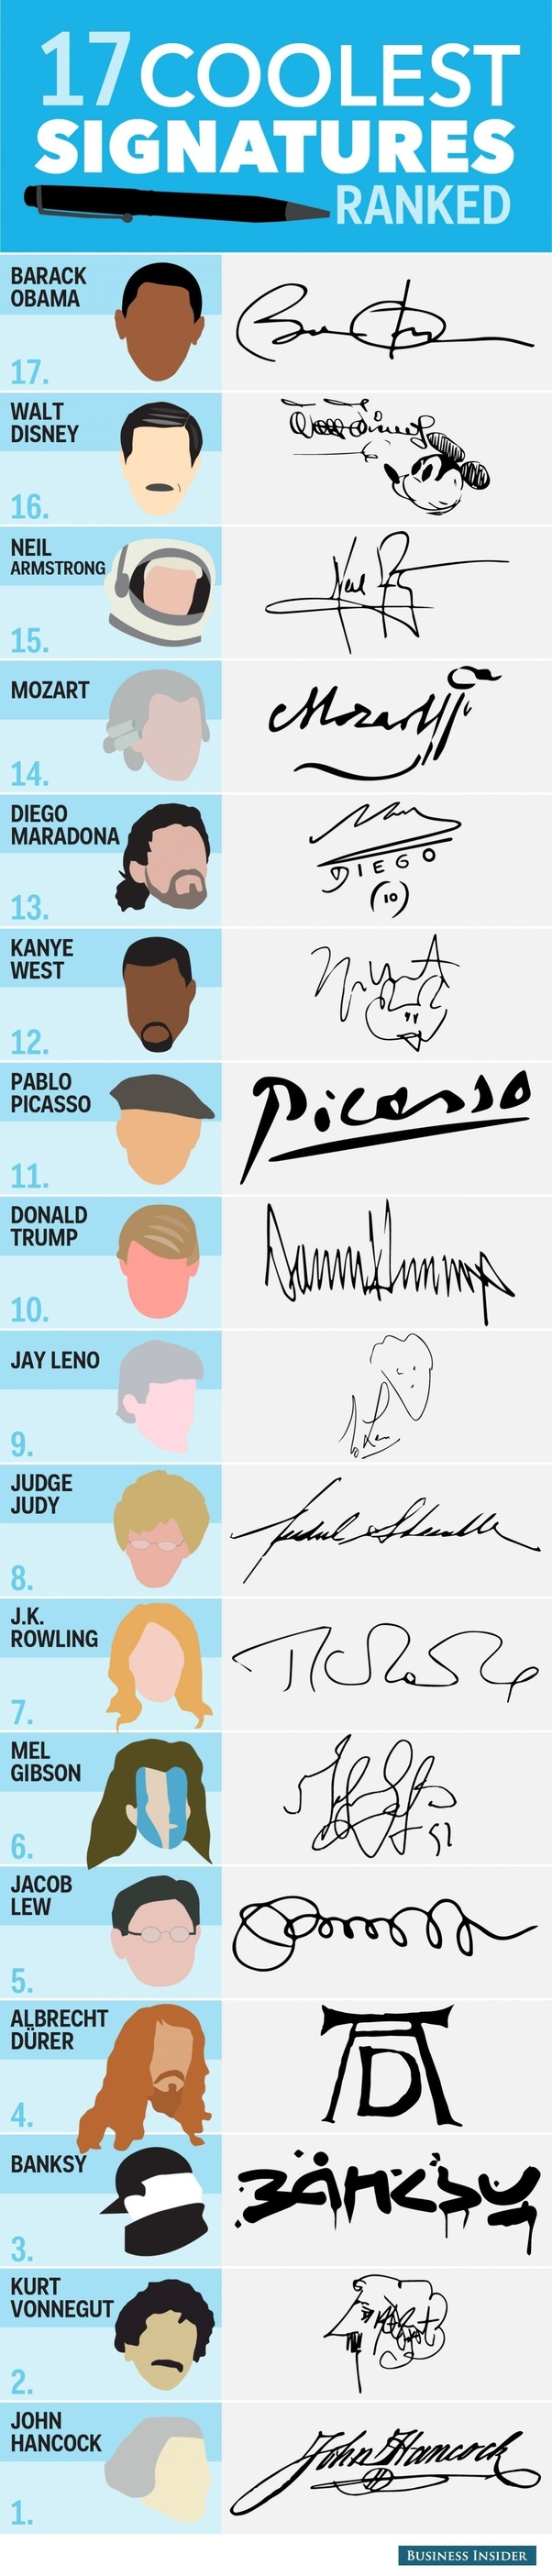 How to create a signature